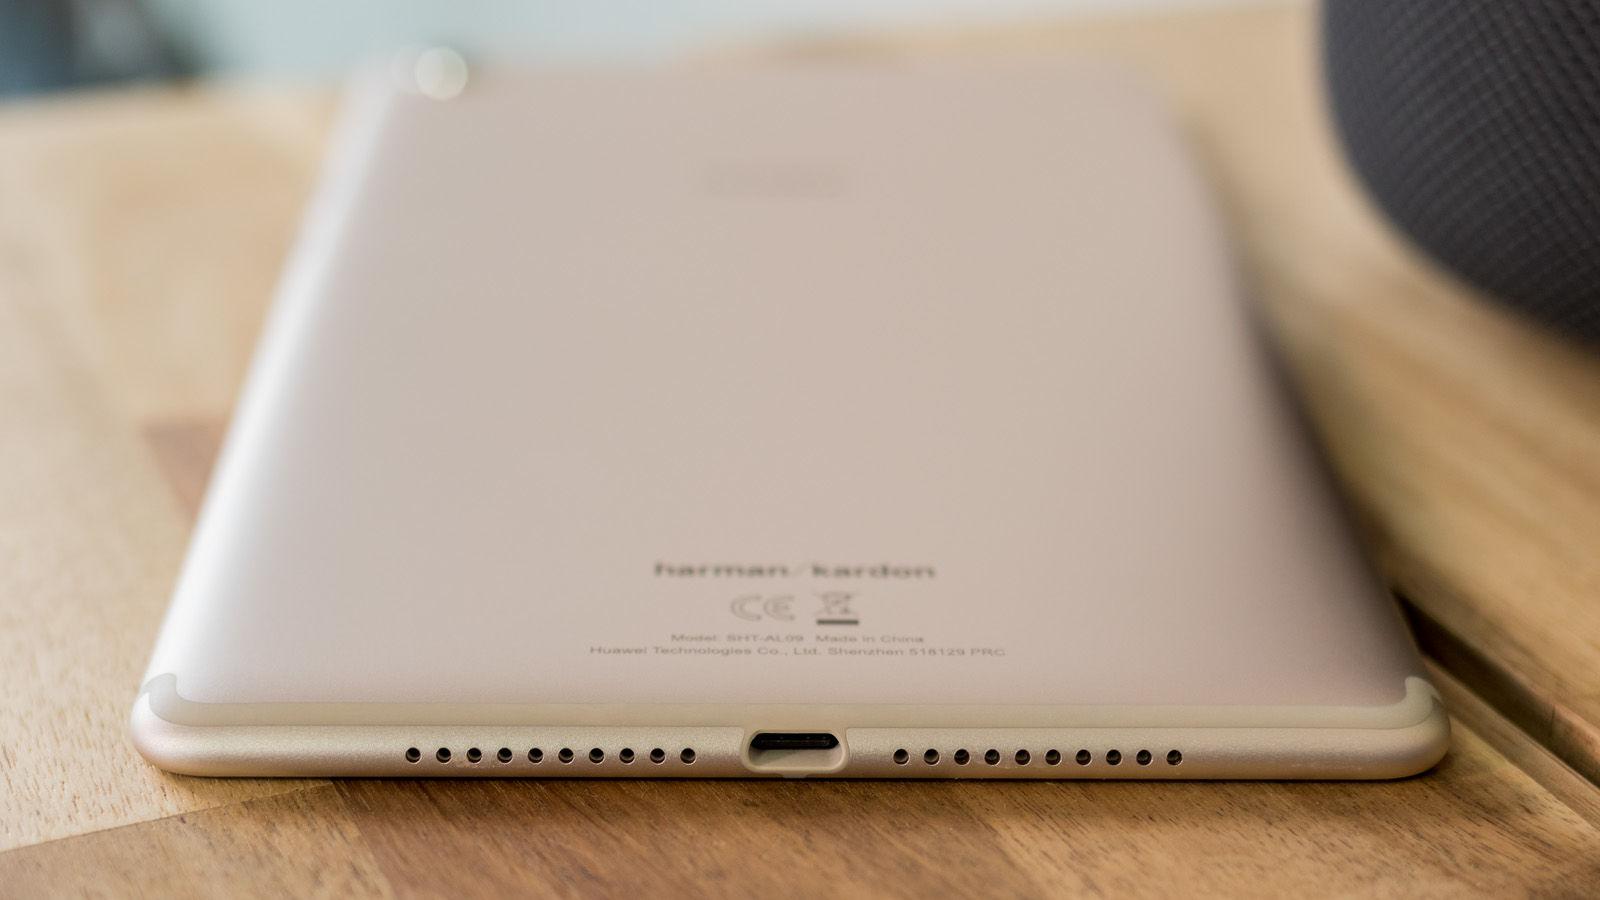 MediaPad M5 8.4 review